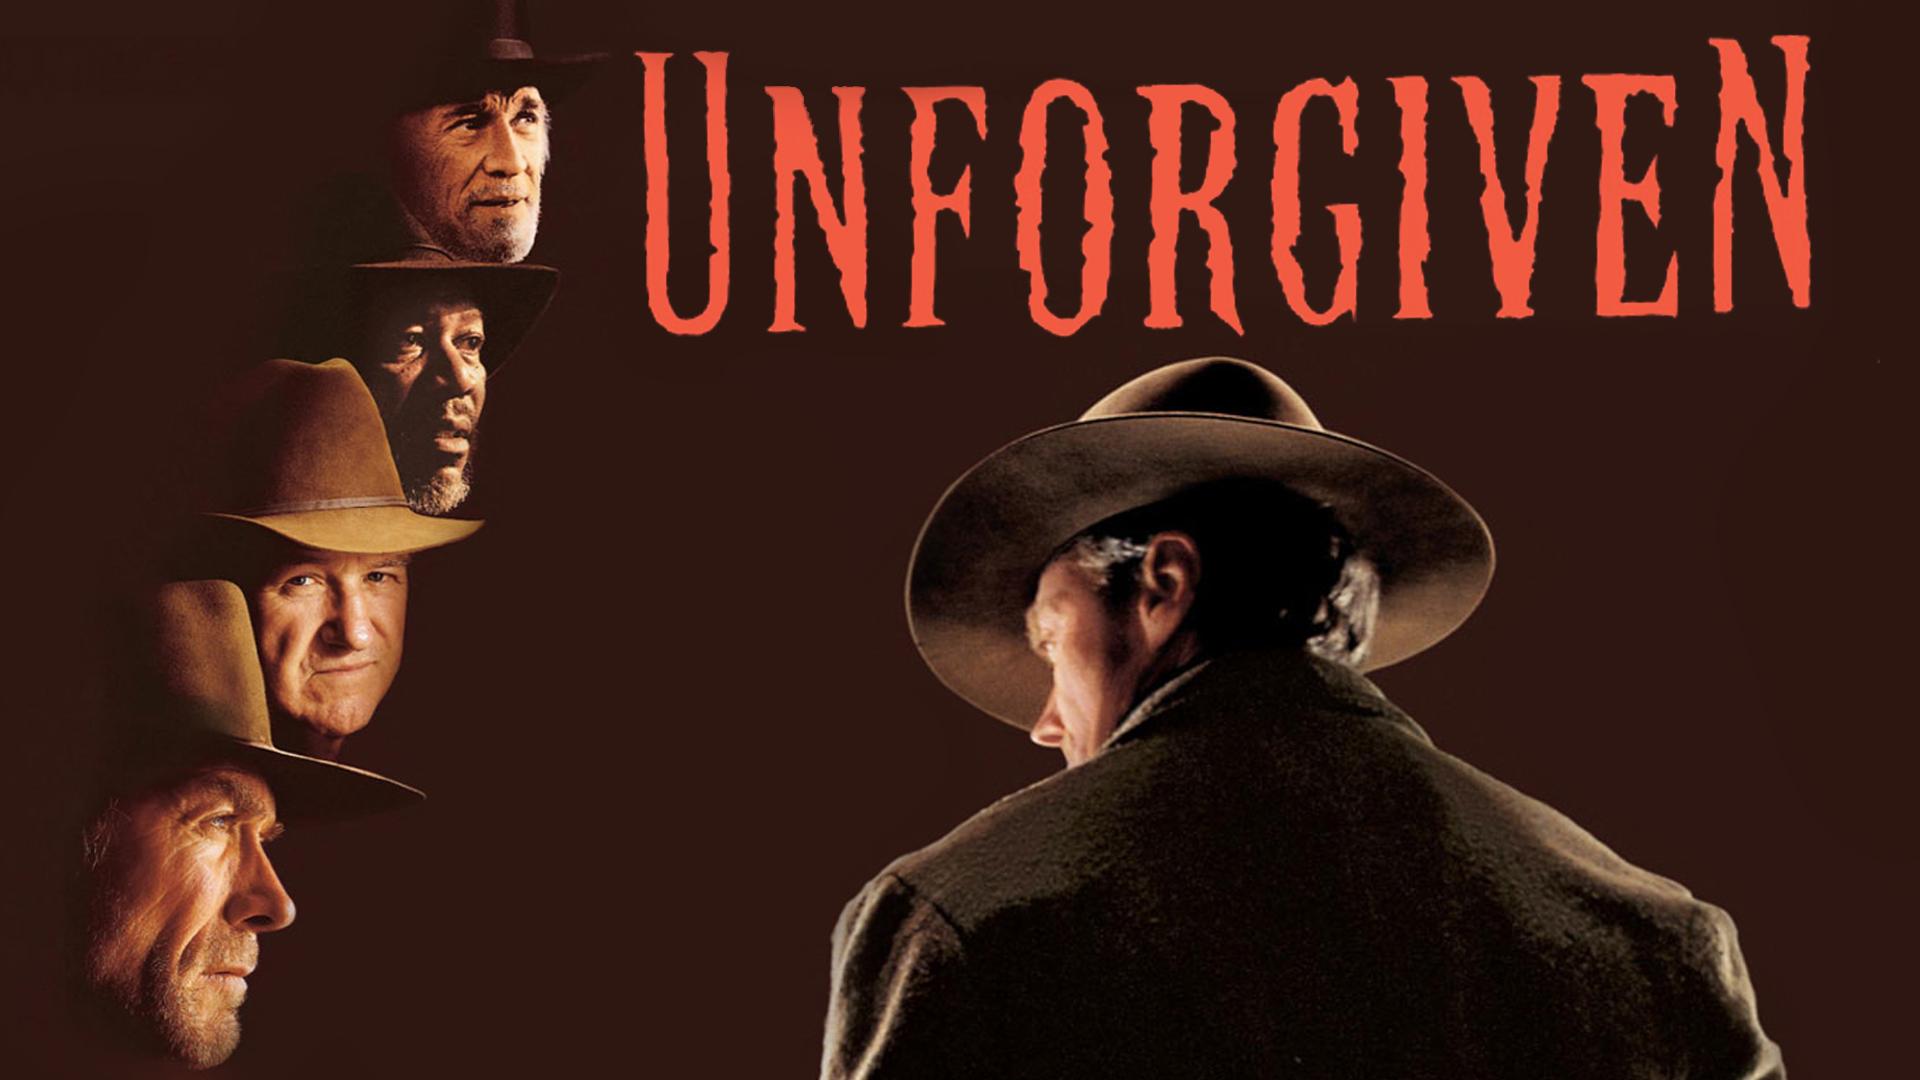 Unforgiven (1992)